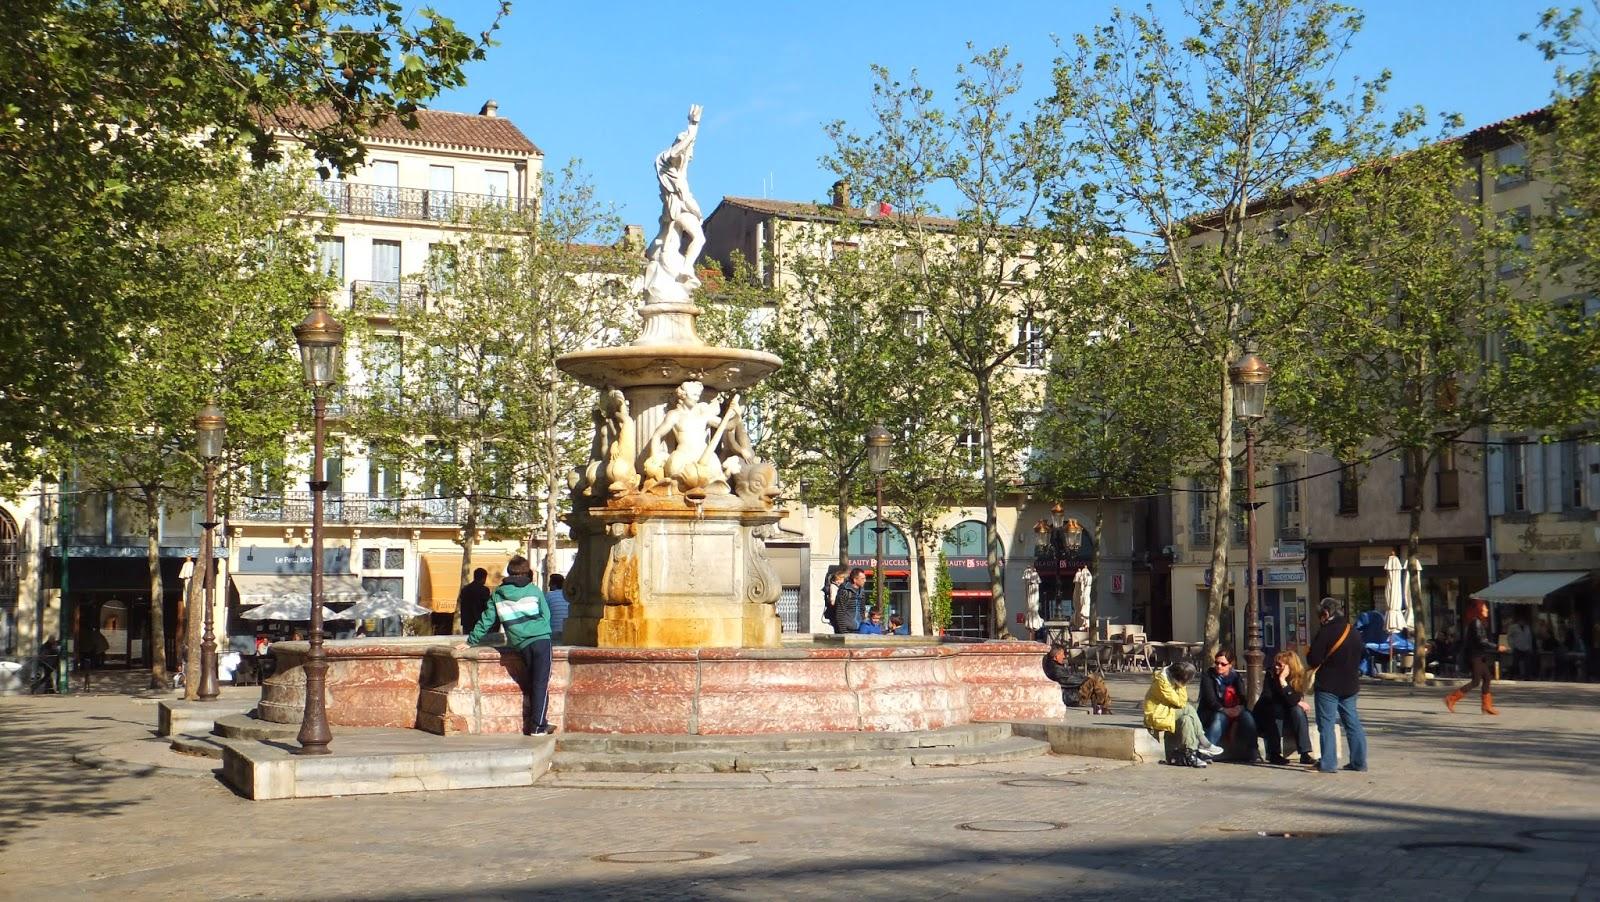 Carcasona, Francia, Carcassonne, blog de viajes, Elisa N, Argentina, Canal de Midi, Canal del Mediodía, Place Carnot